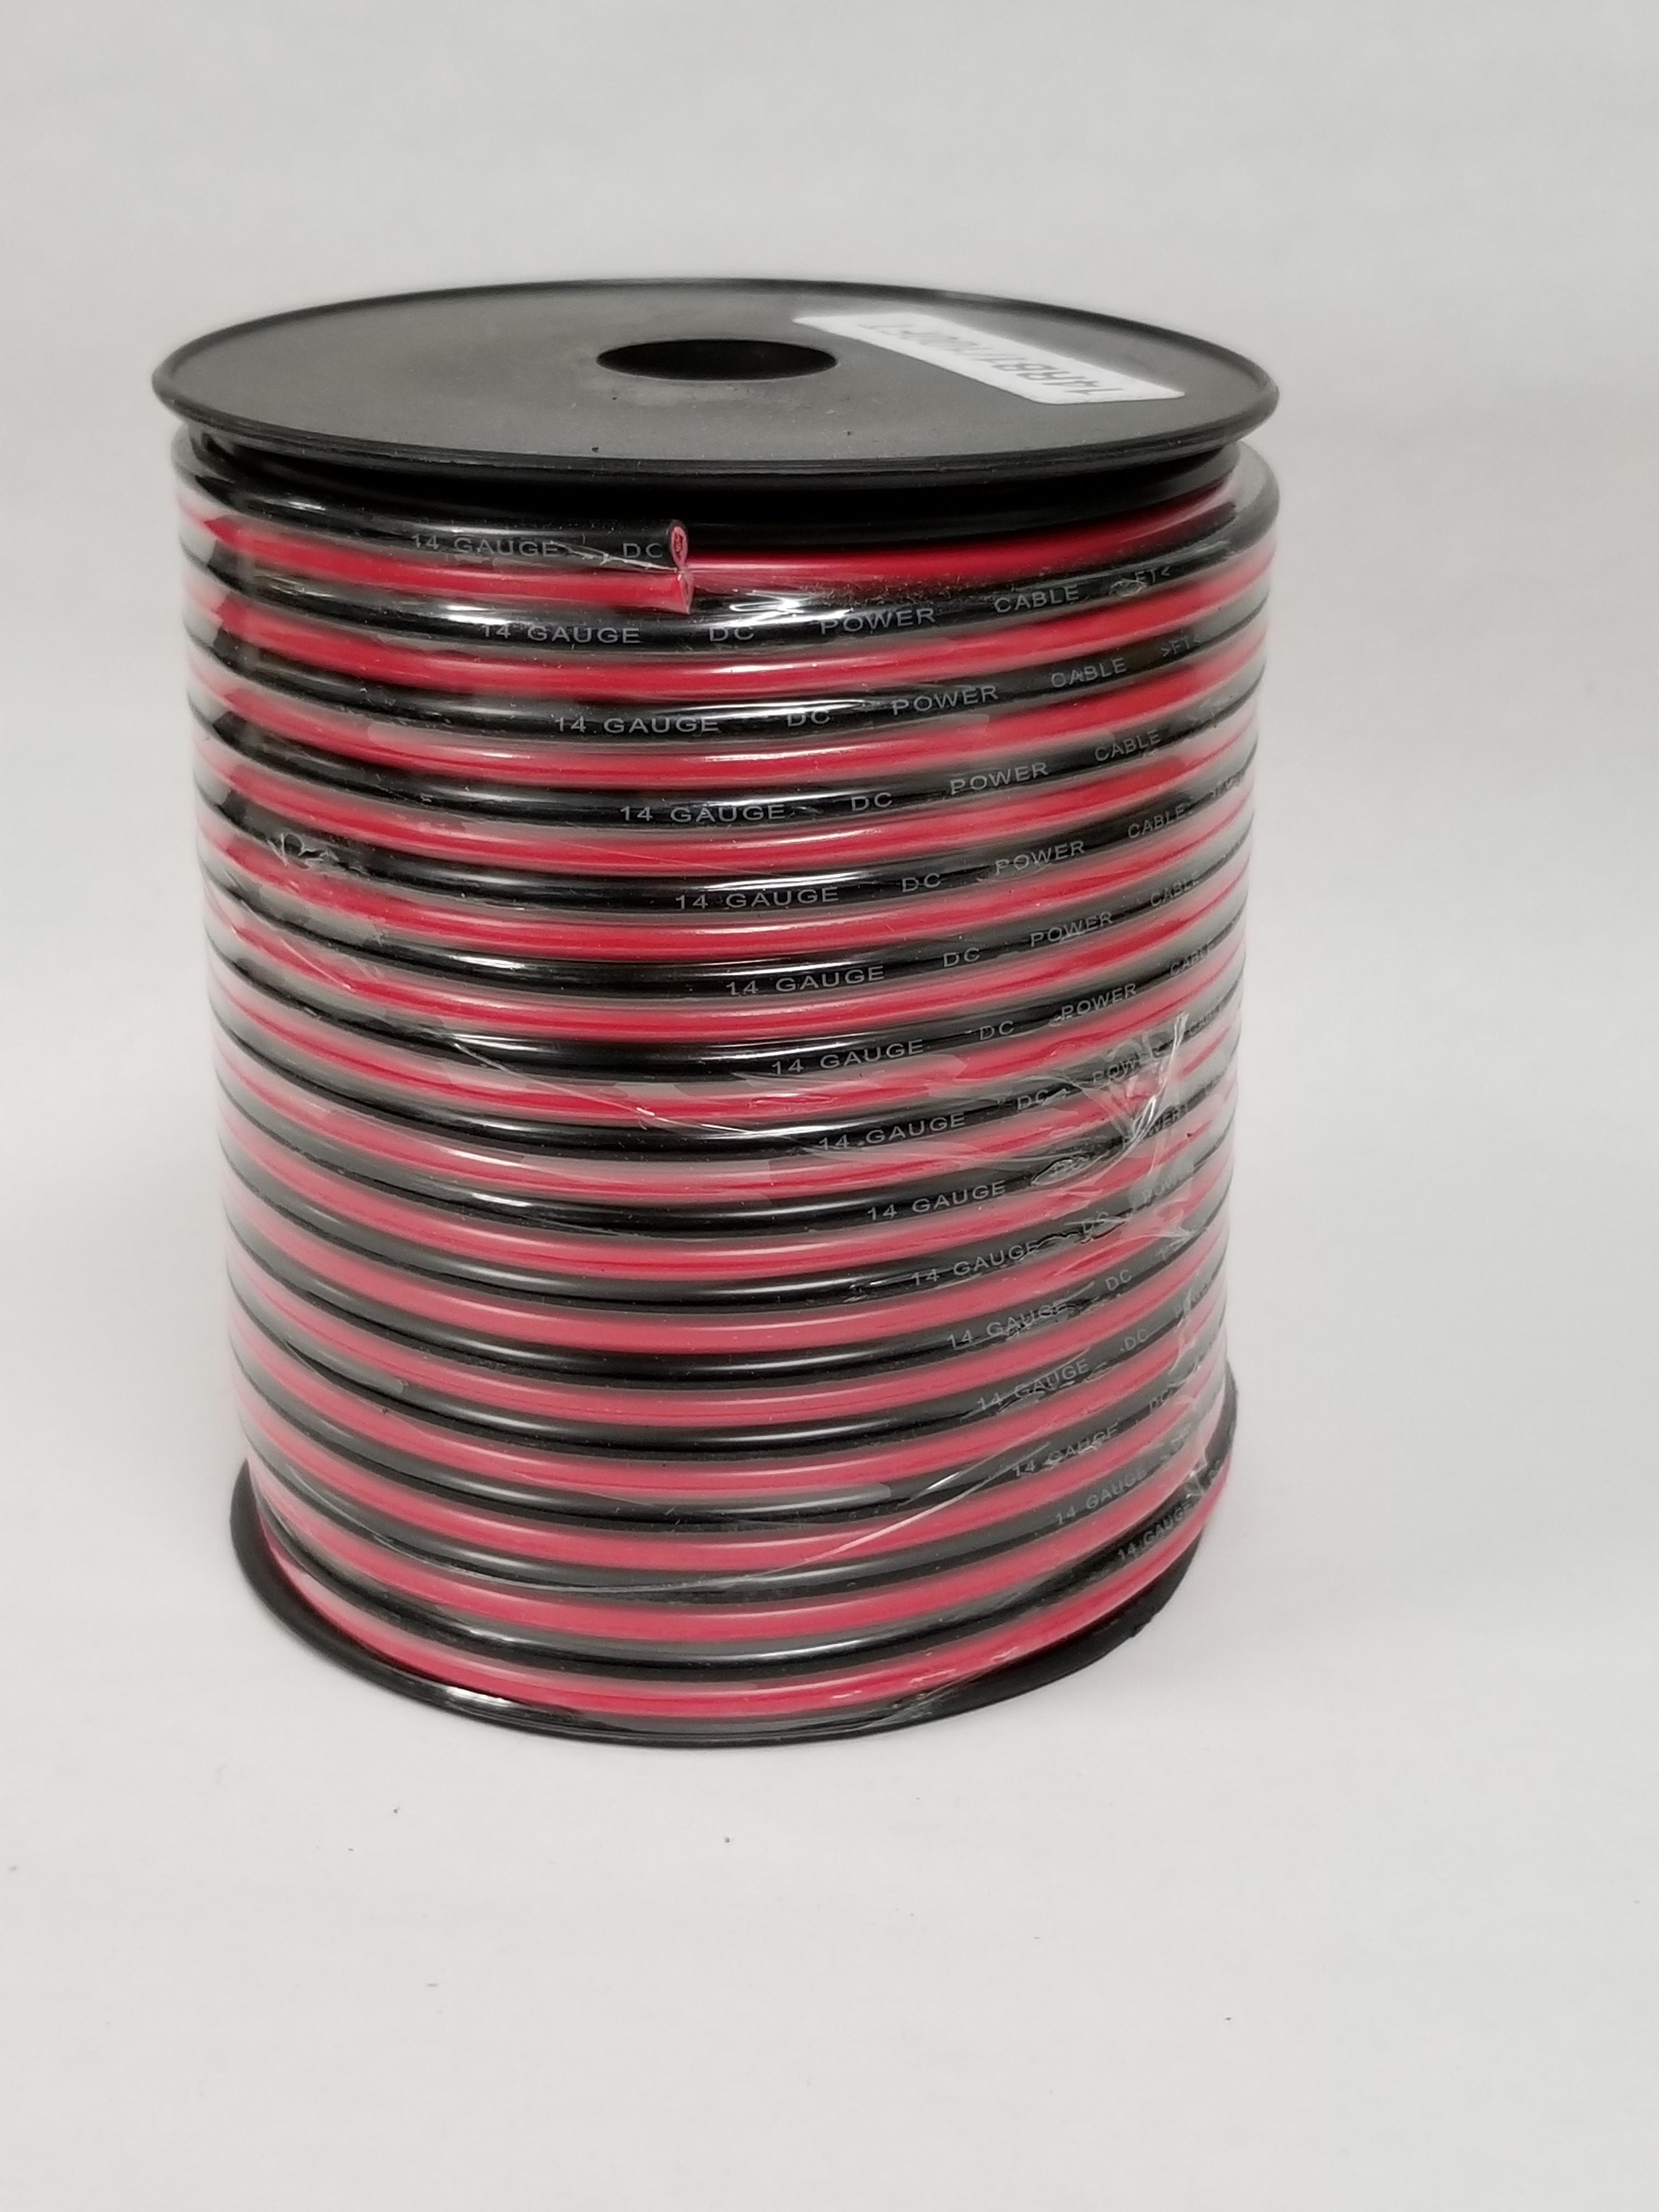 14RB1 - WORKMAN 100 FOOT SPOOL OF 14 GAUGE RED/BLACK DC ZIP WIRE